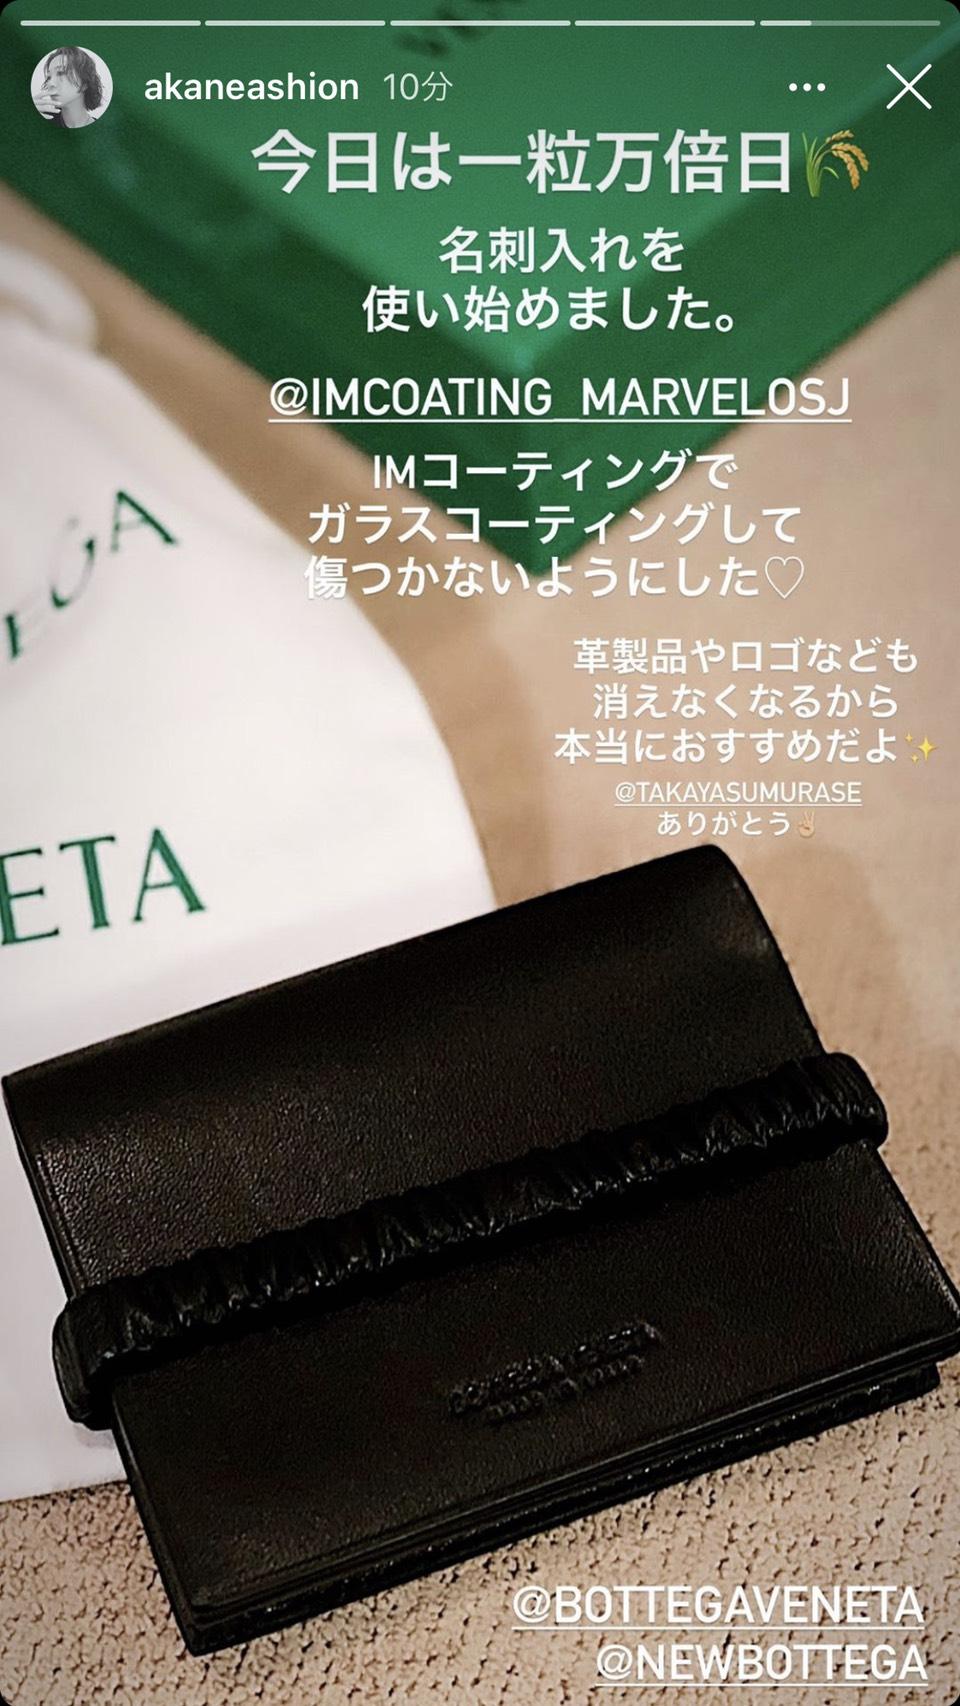 【akaneashion様】革の名刺入れのコーティング施工